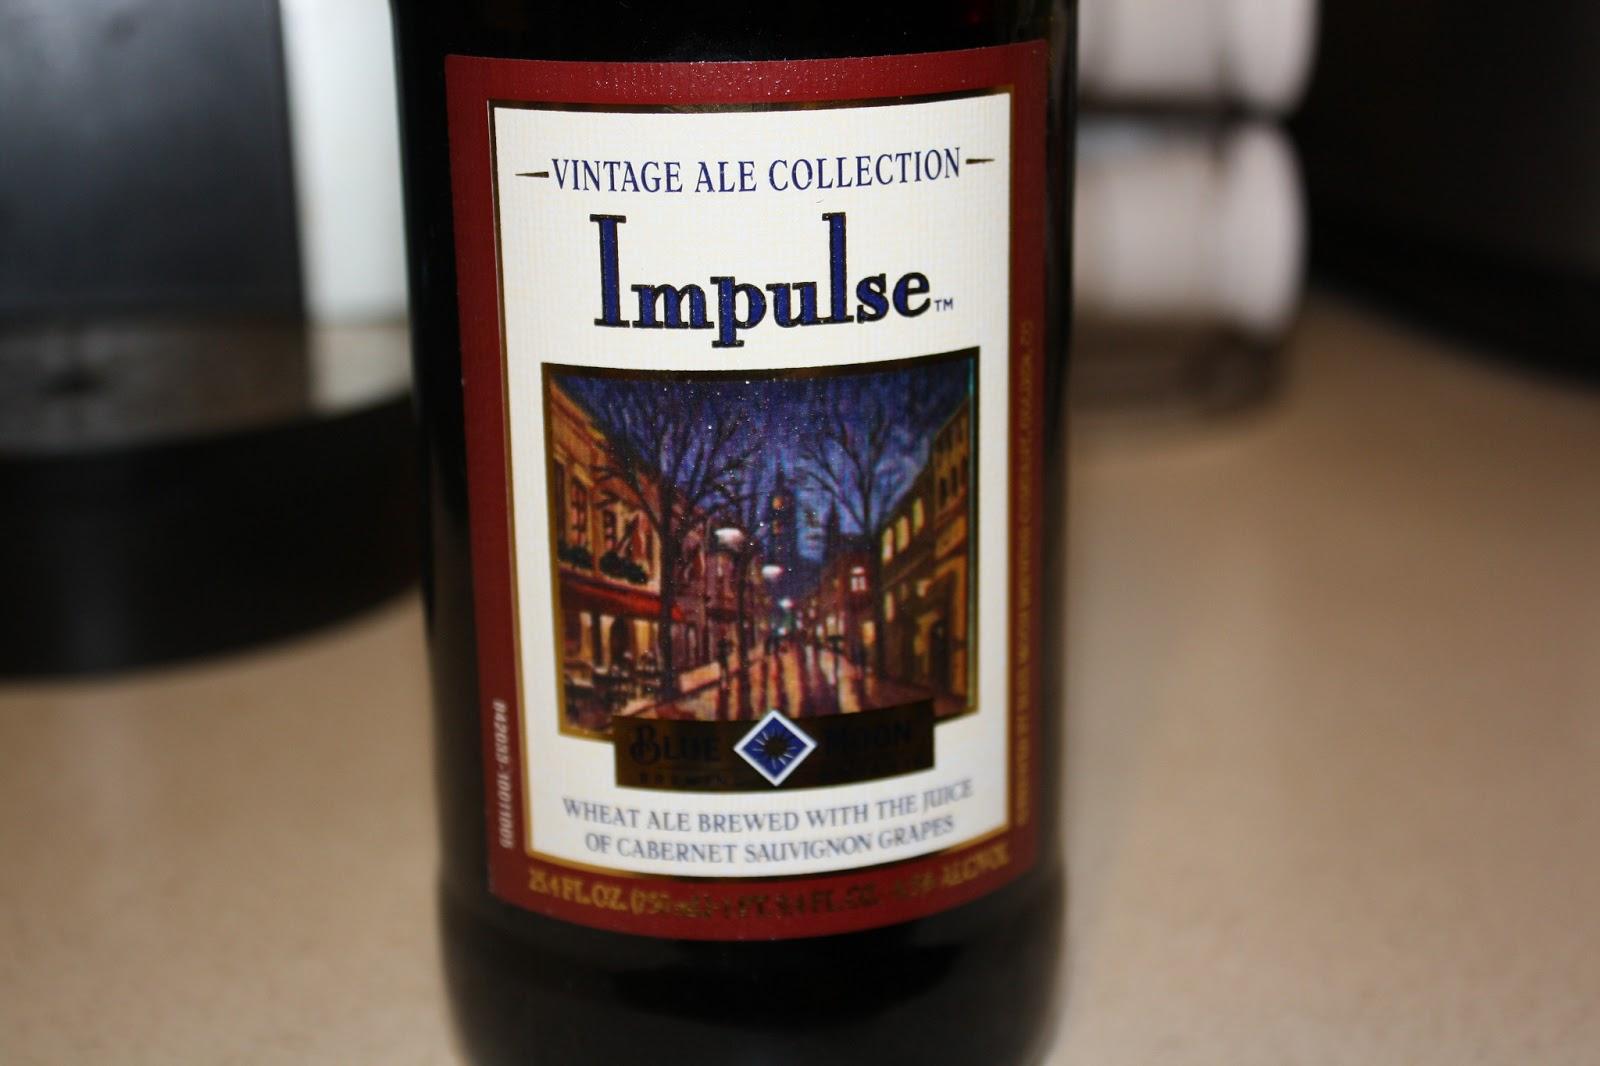 Blue Moon Impulse, Vintage Ale Collection